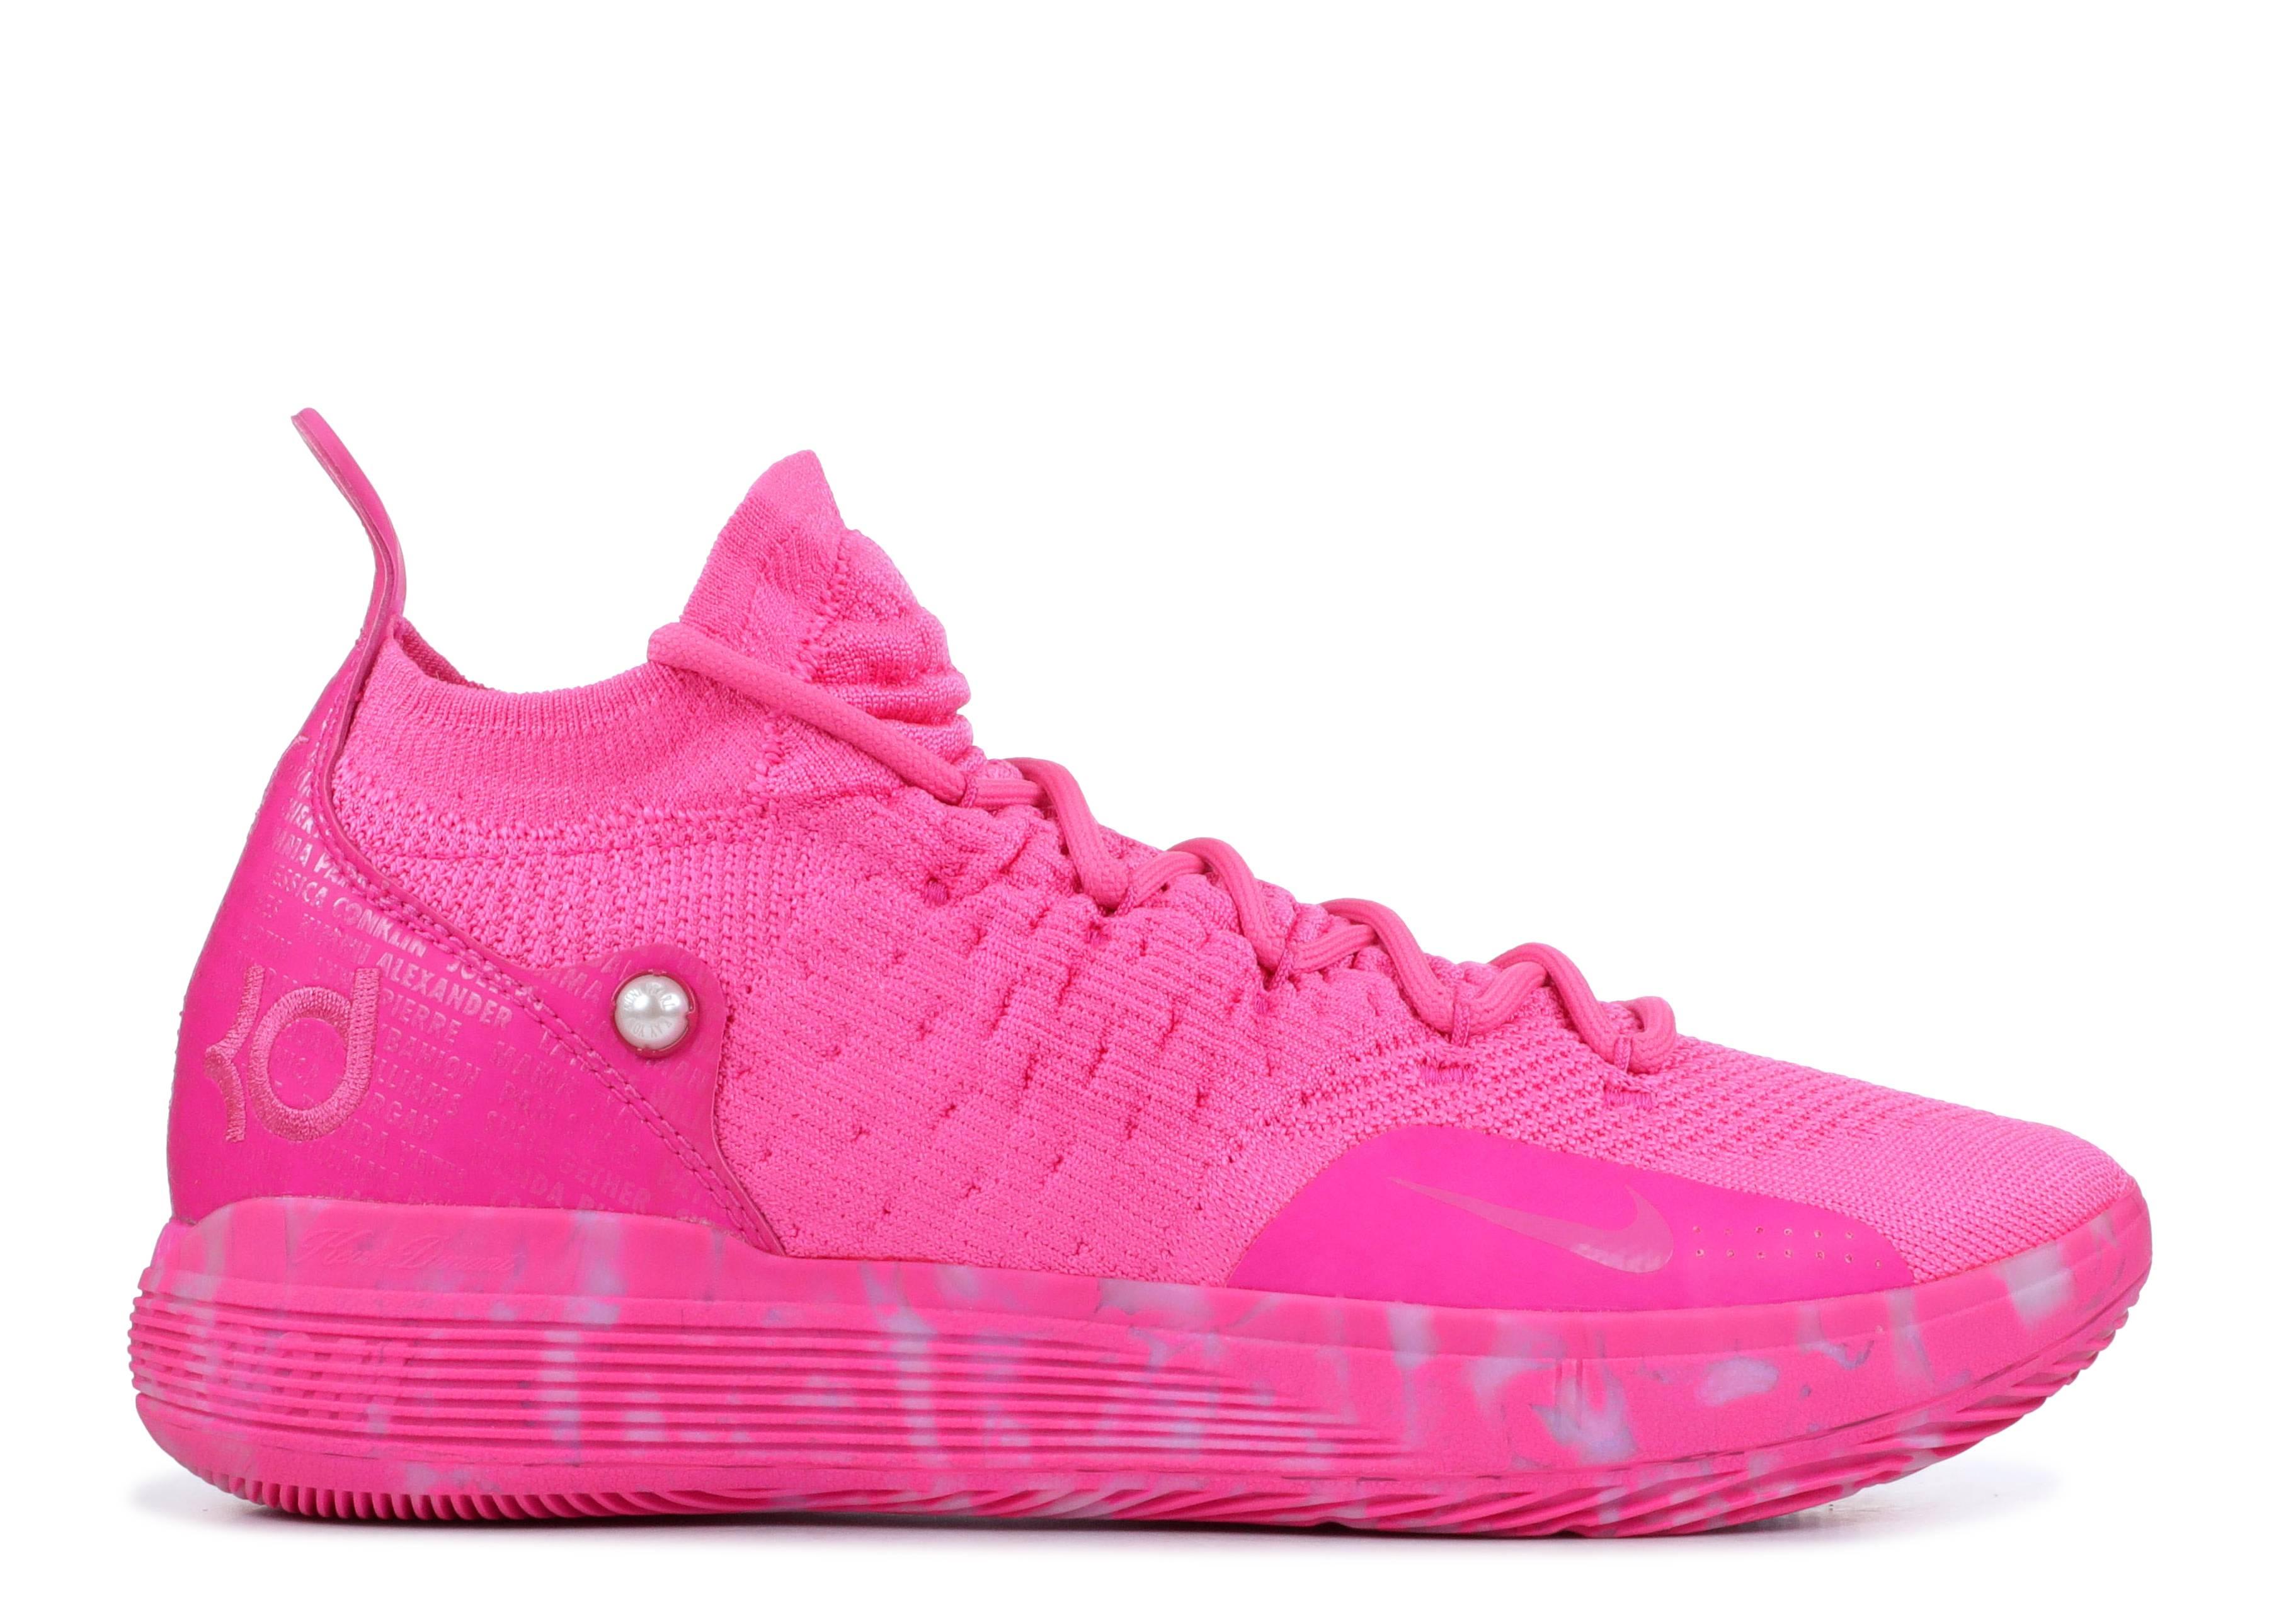 cad3ff9f63f9 Nike Zoom Kd11 Ap